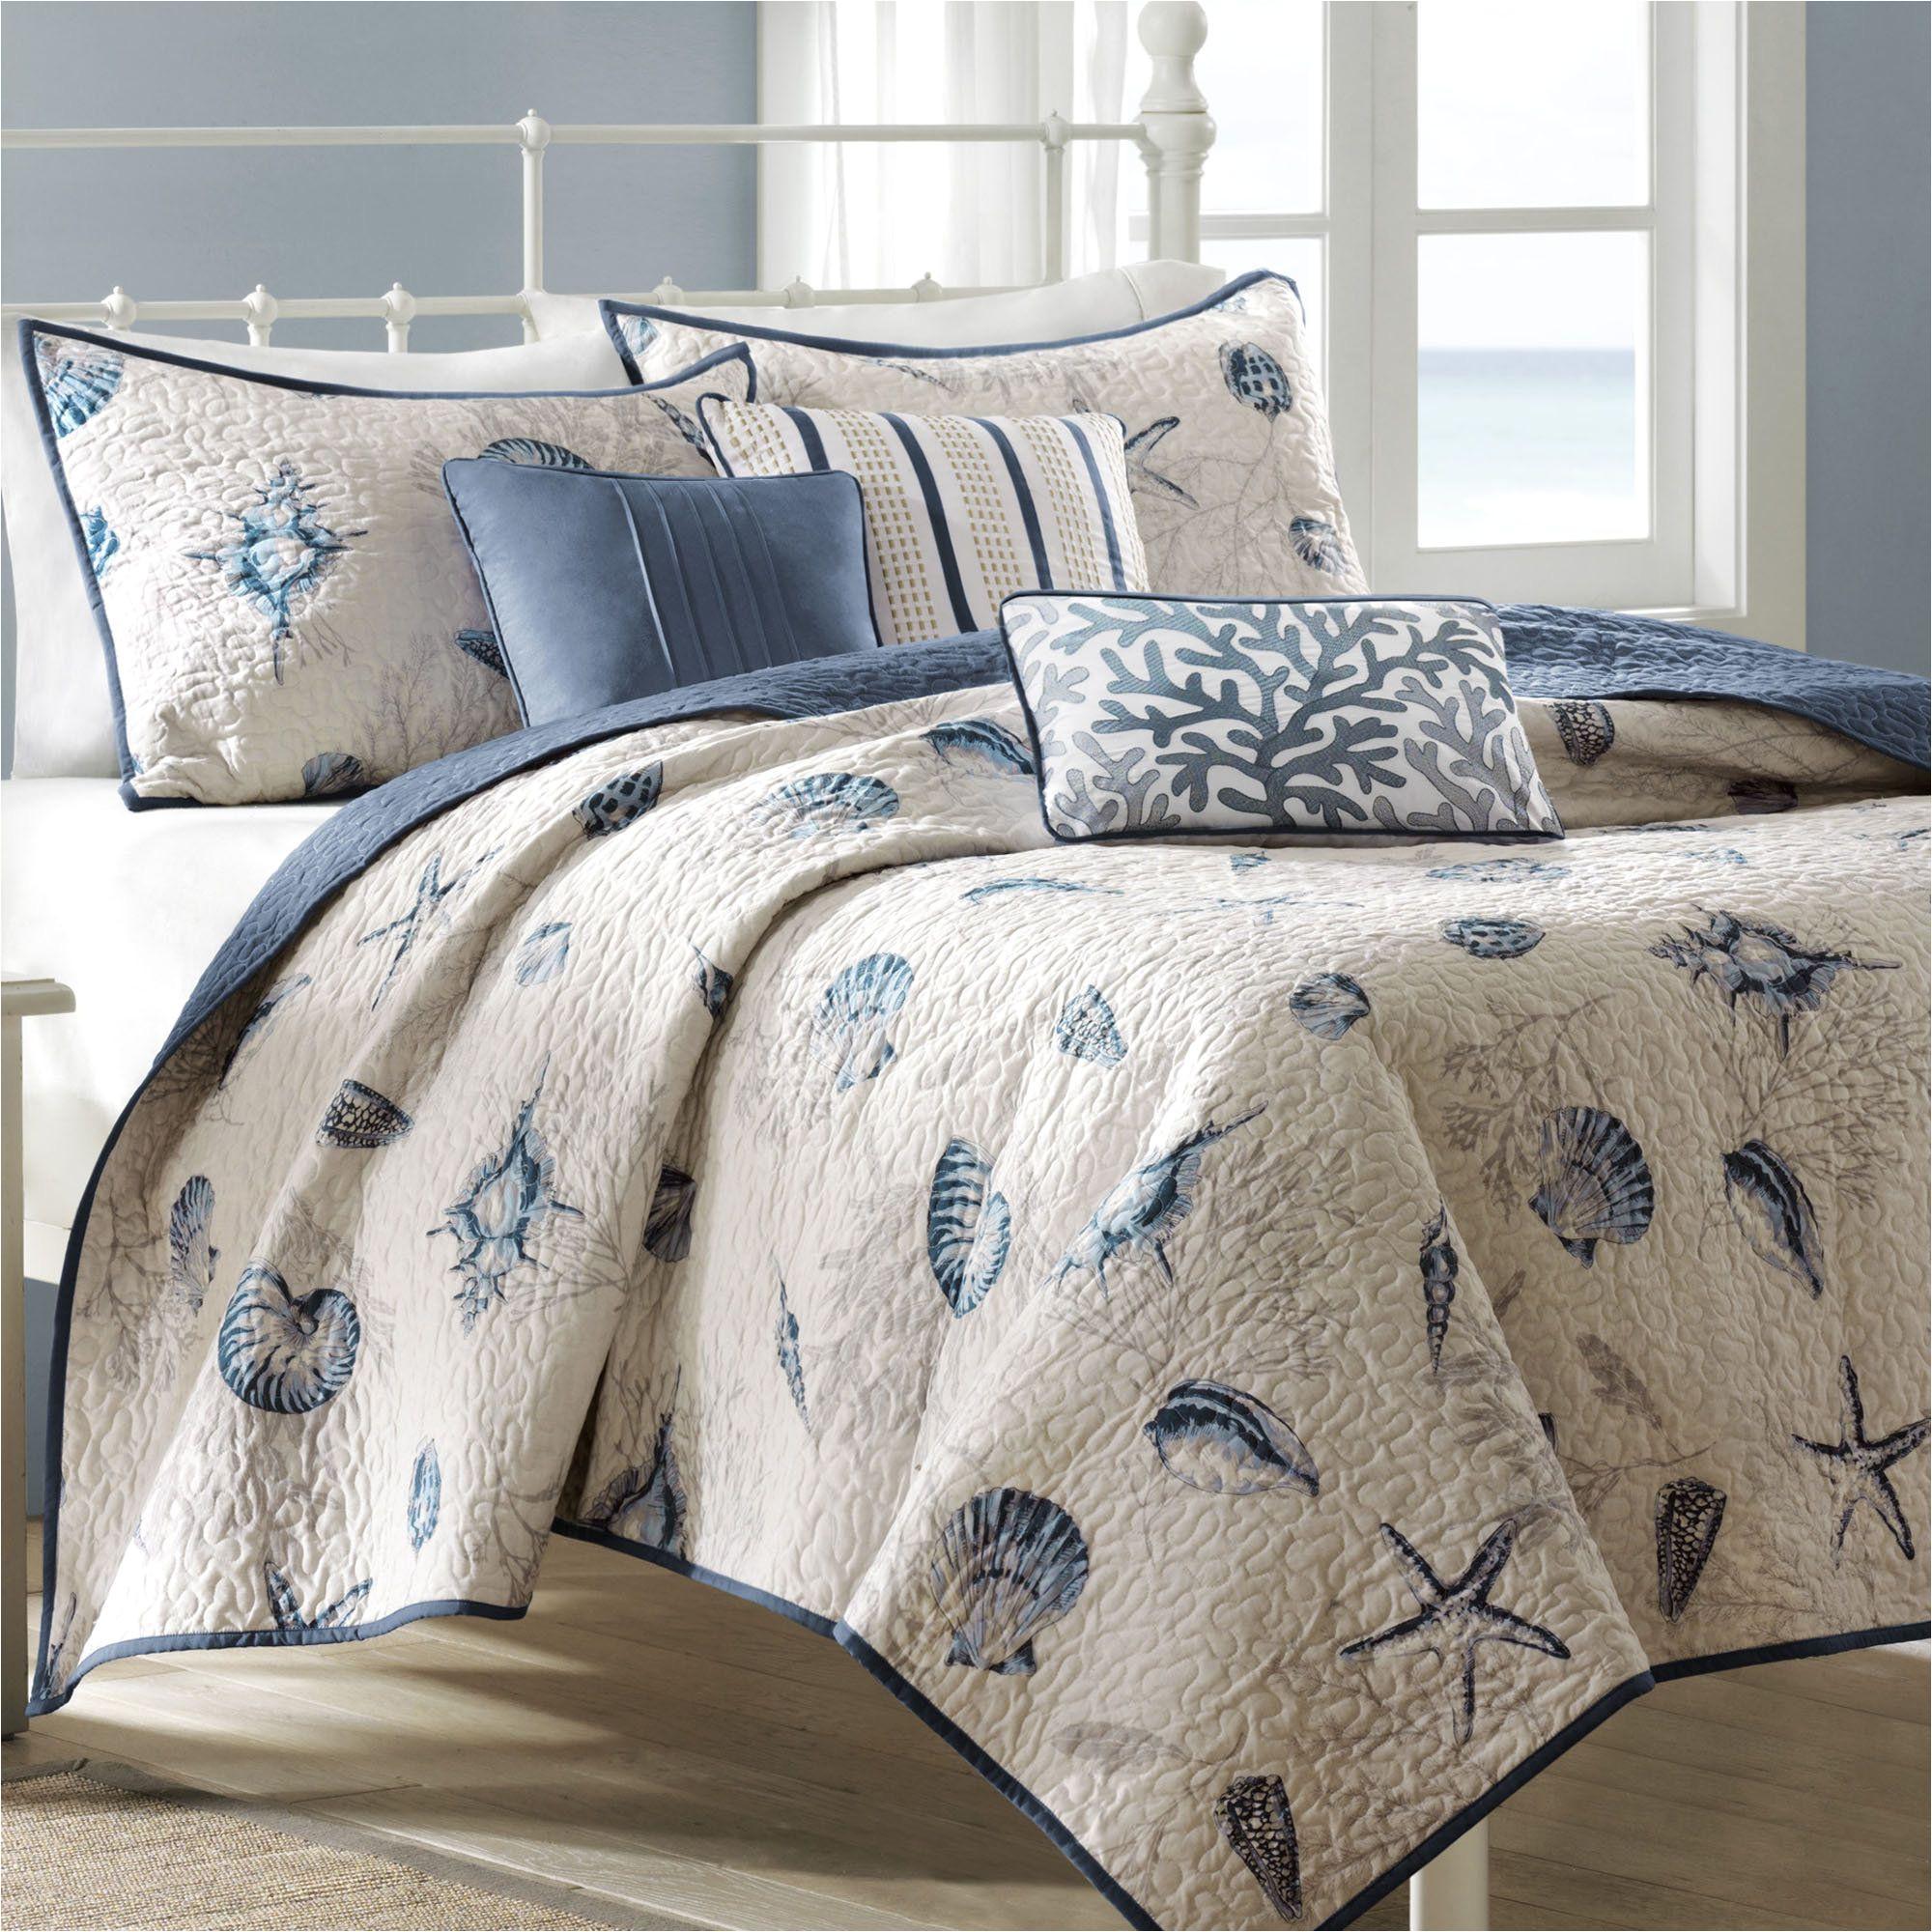 sea shell bedding seashell bedding comforter set